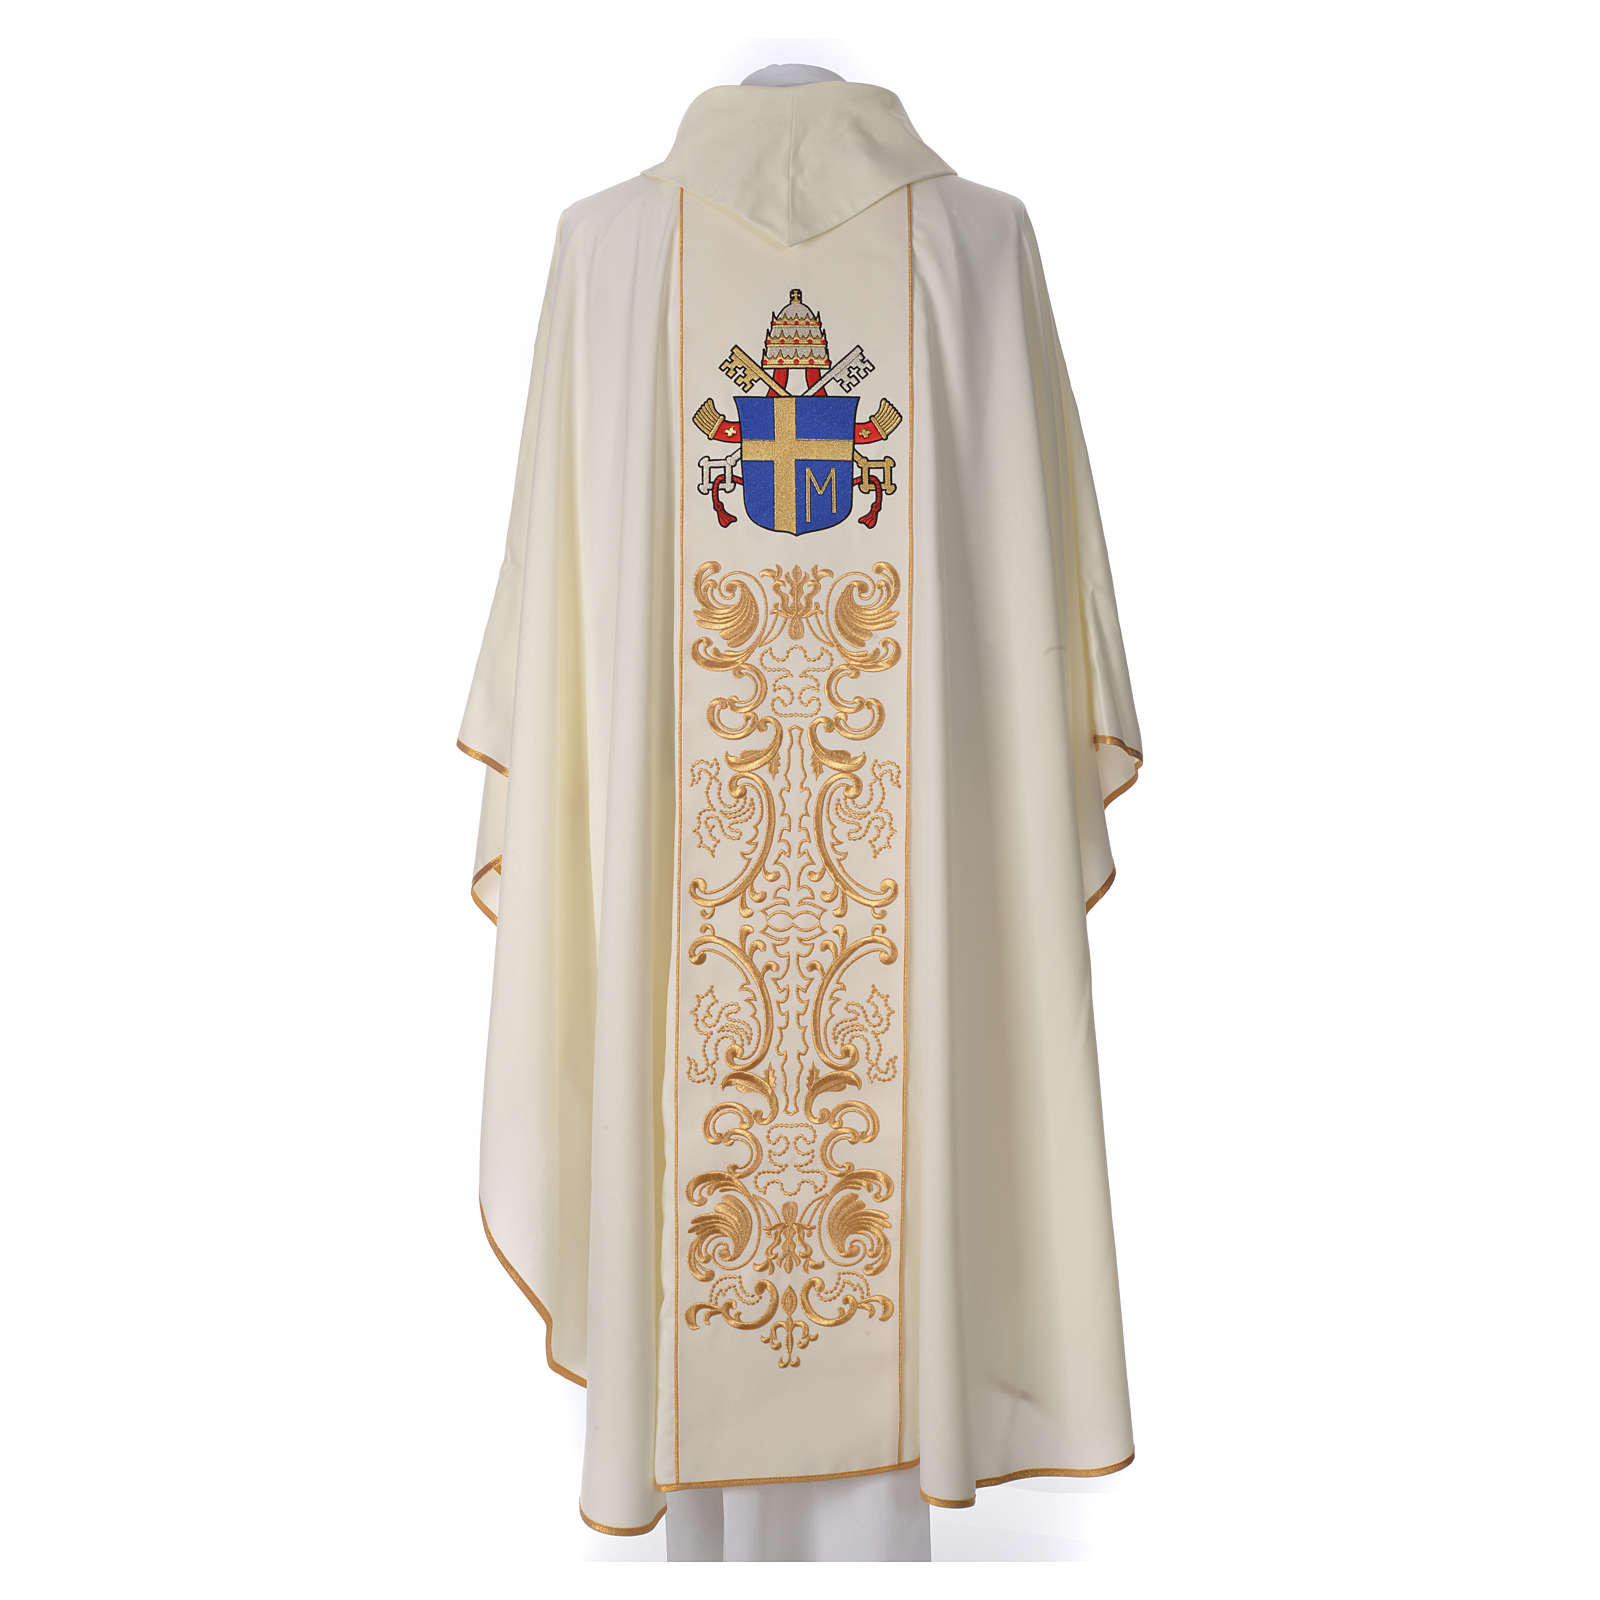 Casula 80% poliestere 20% lana Giovanni Paolo II 4